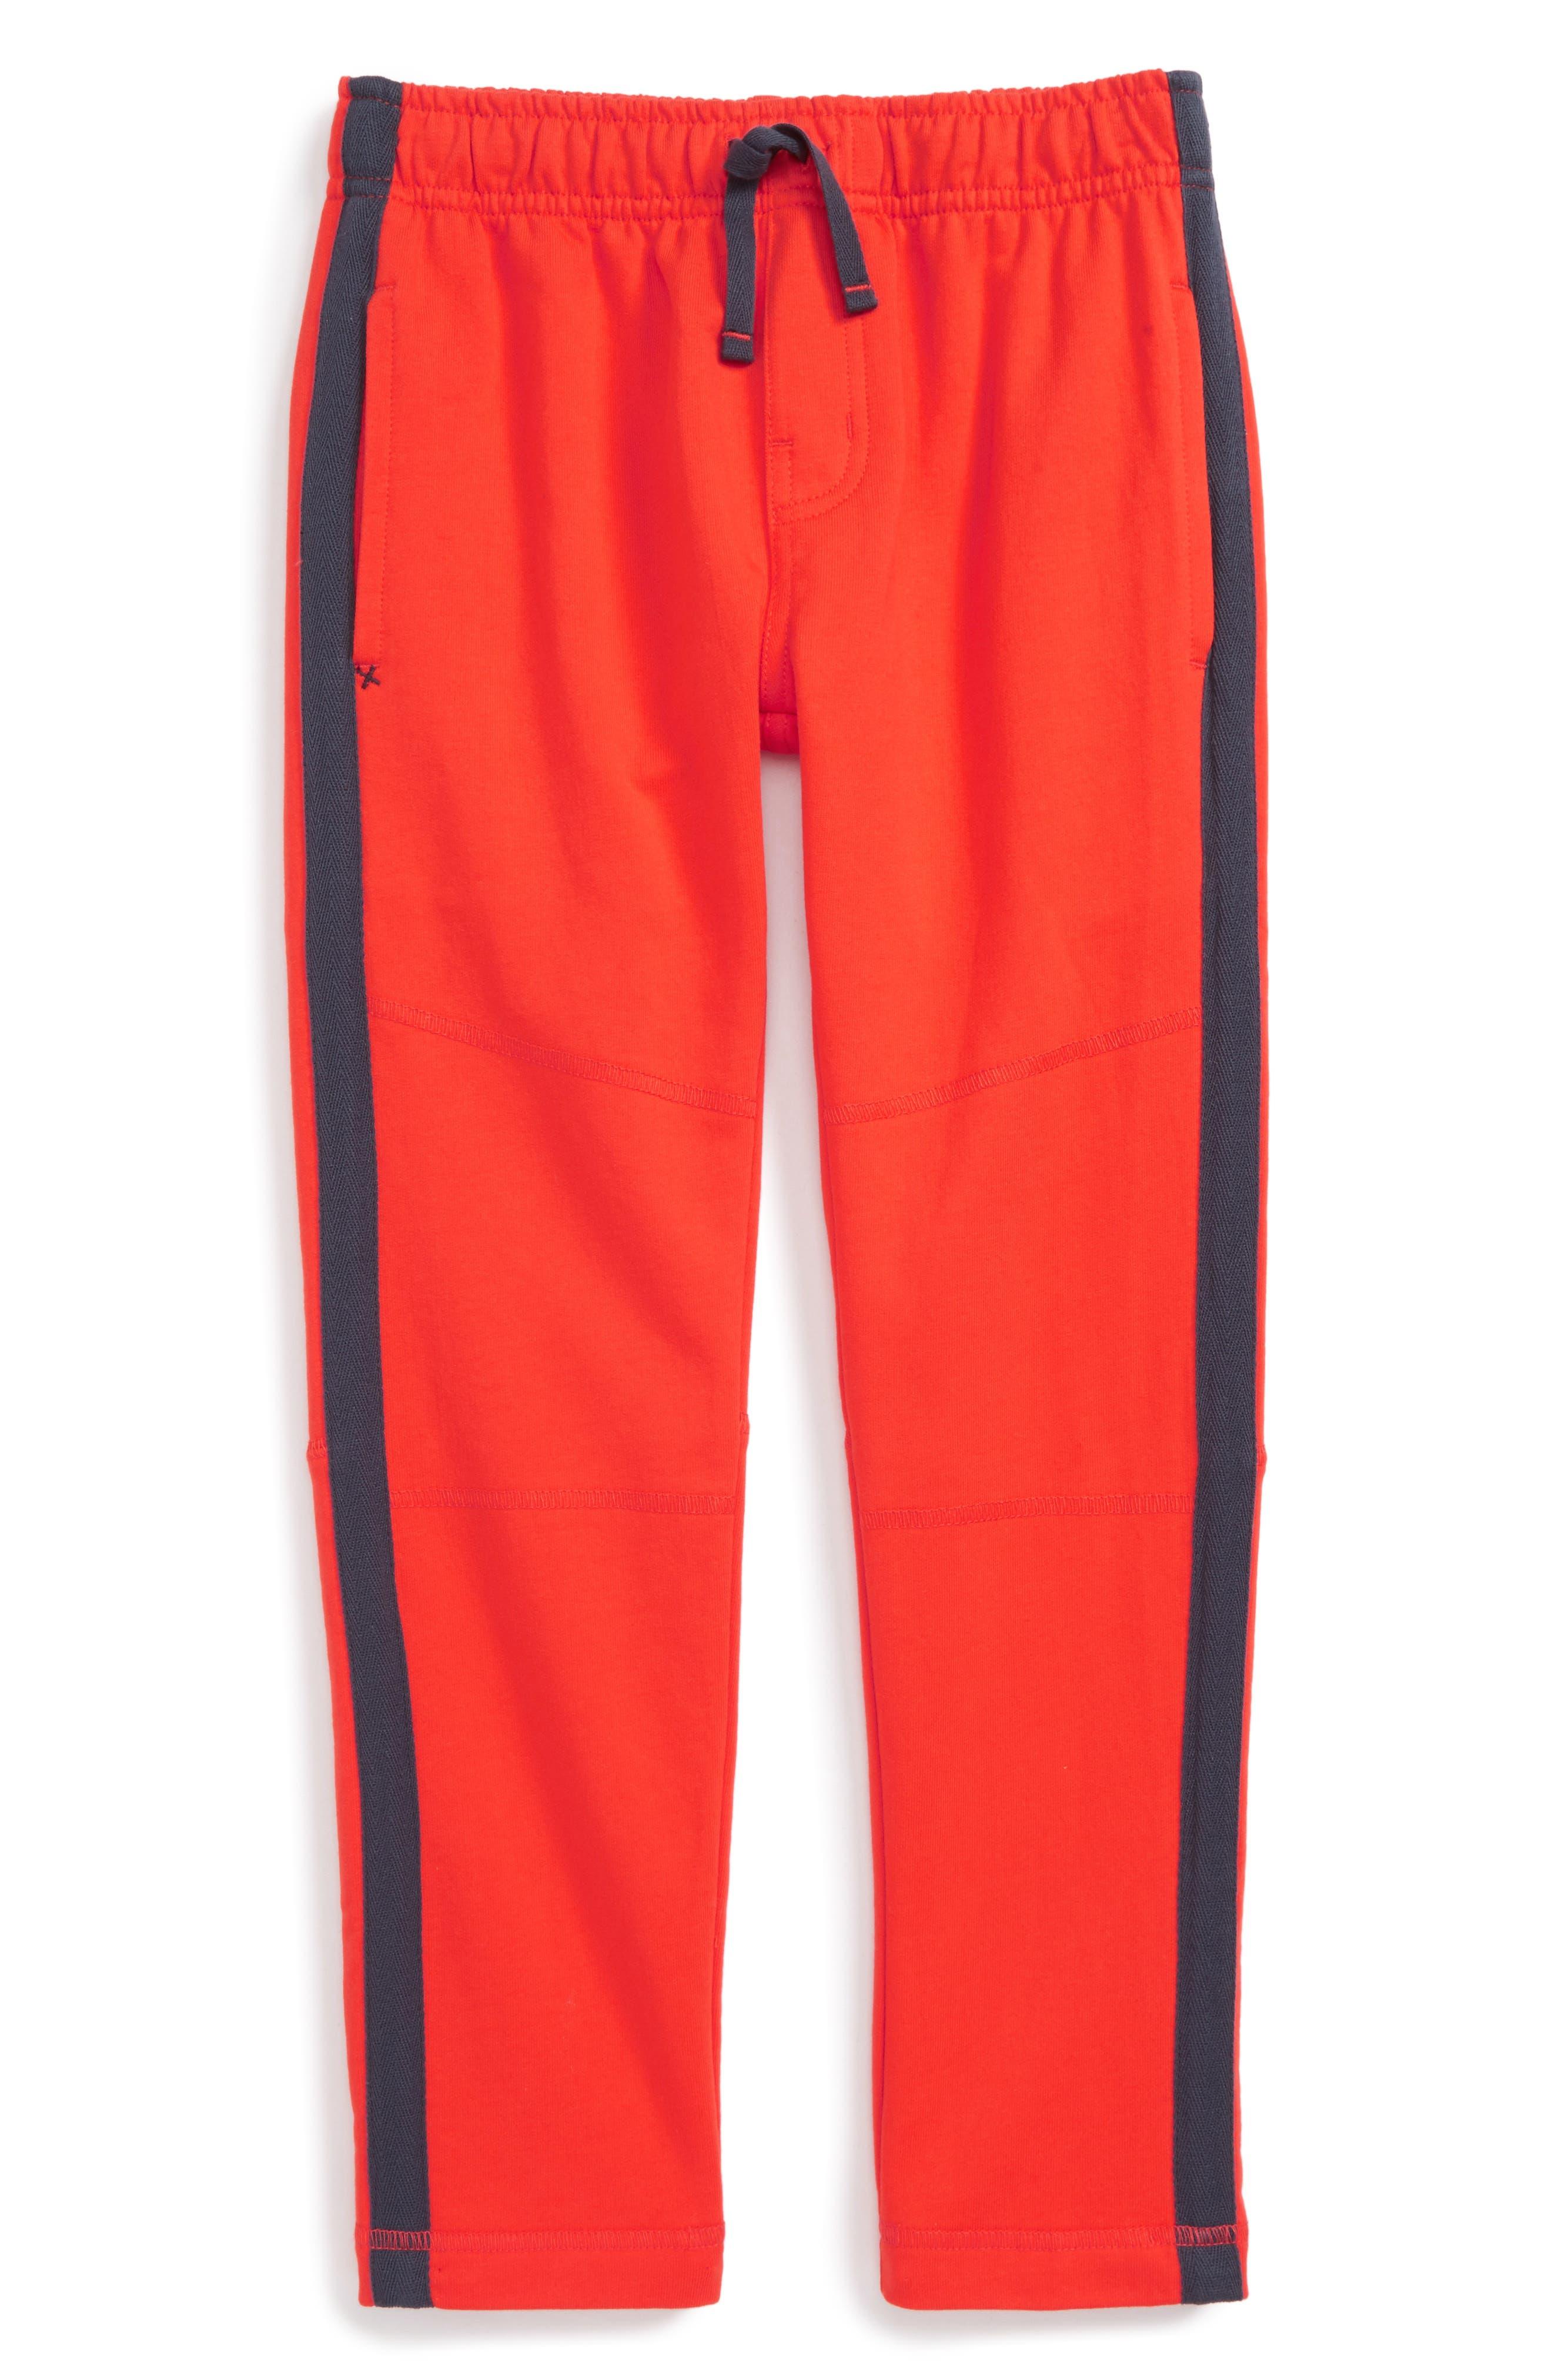 Main Image - Tea Collection Side Stripe Knit Pants (Toddler Boys & Little Boys)